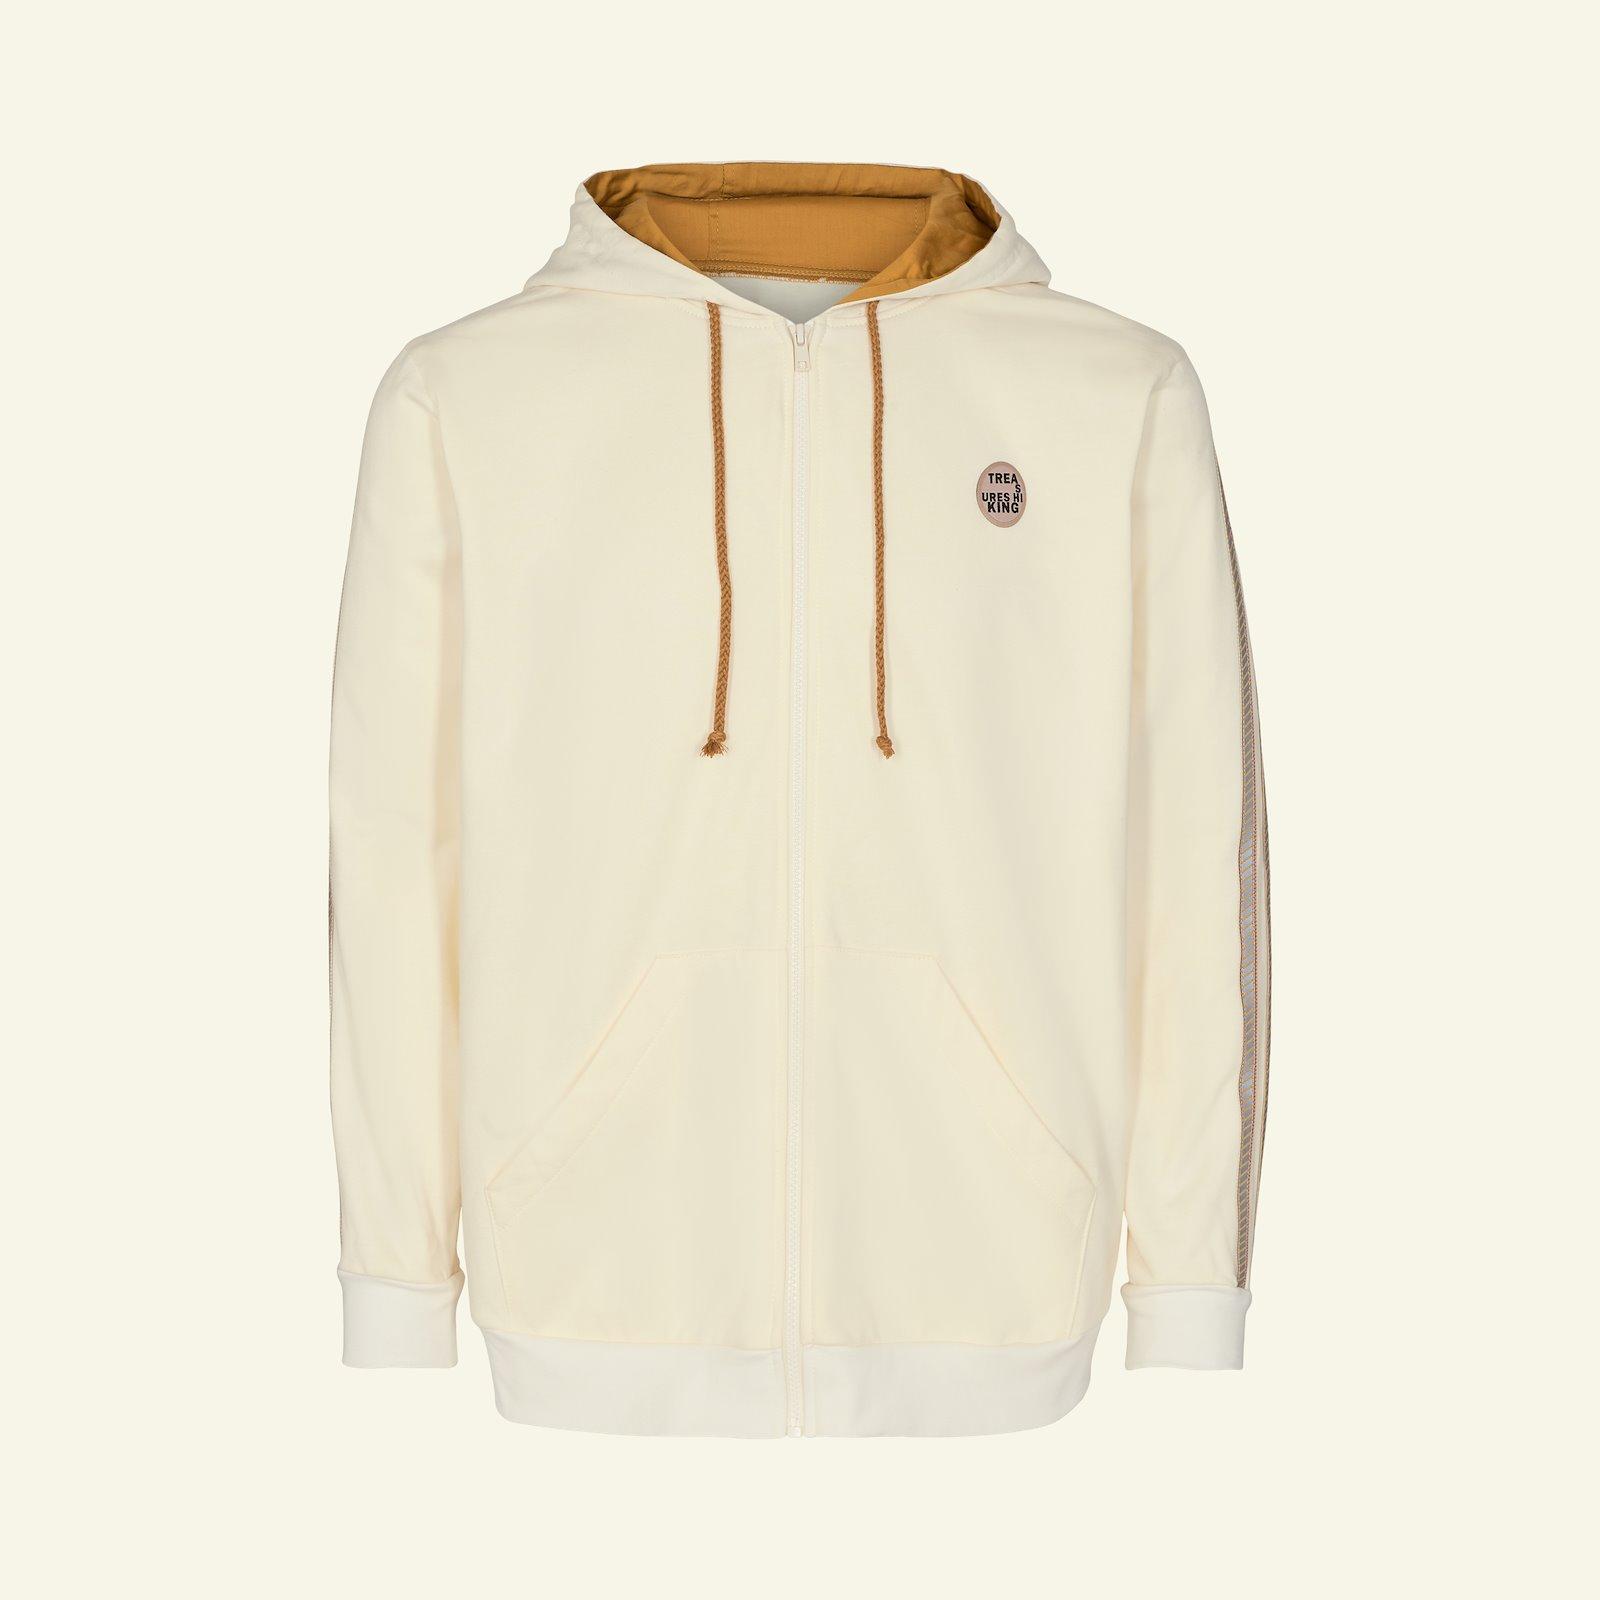 Sweatshirt og sweatpants, S p86001_211760_816219_230635_21476_75235_26519_sskit